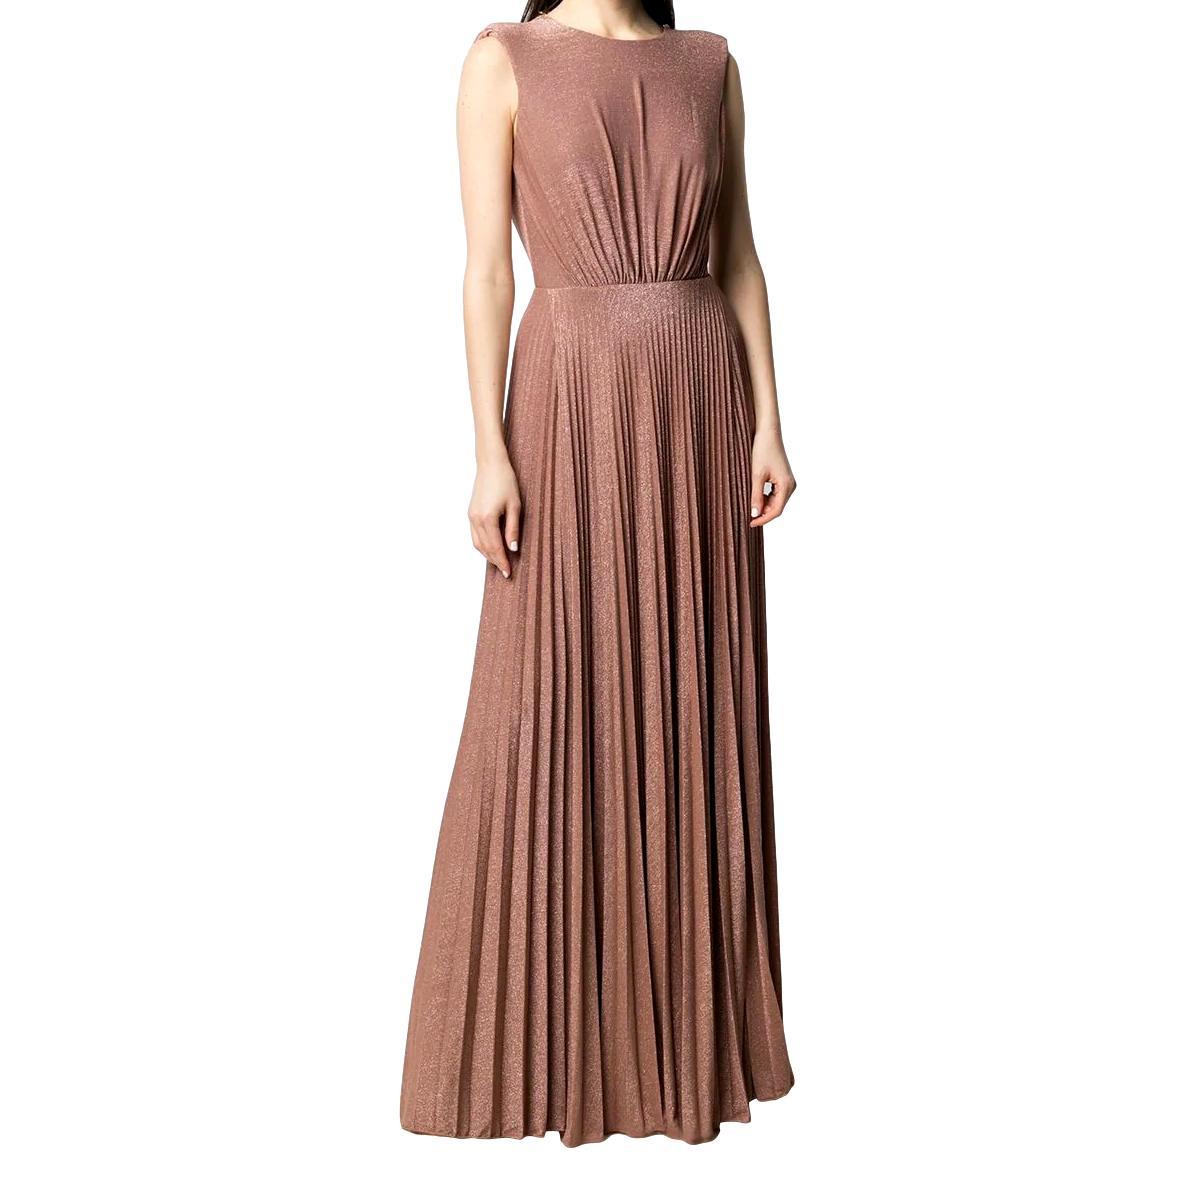 Pleated floor-length dress ELISABETTA FRANCHI |  | AB05211E2W71